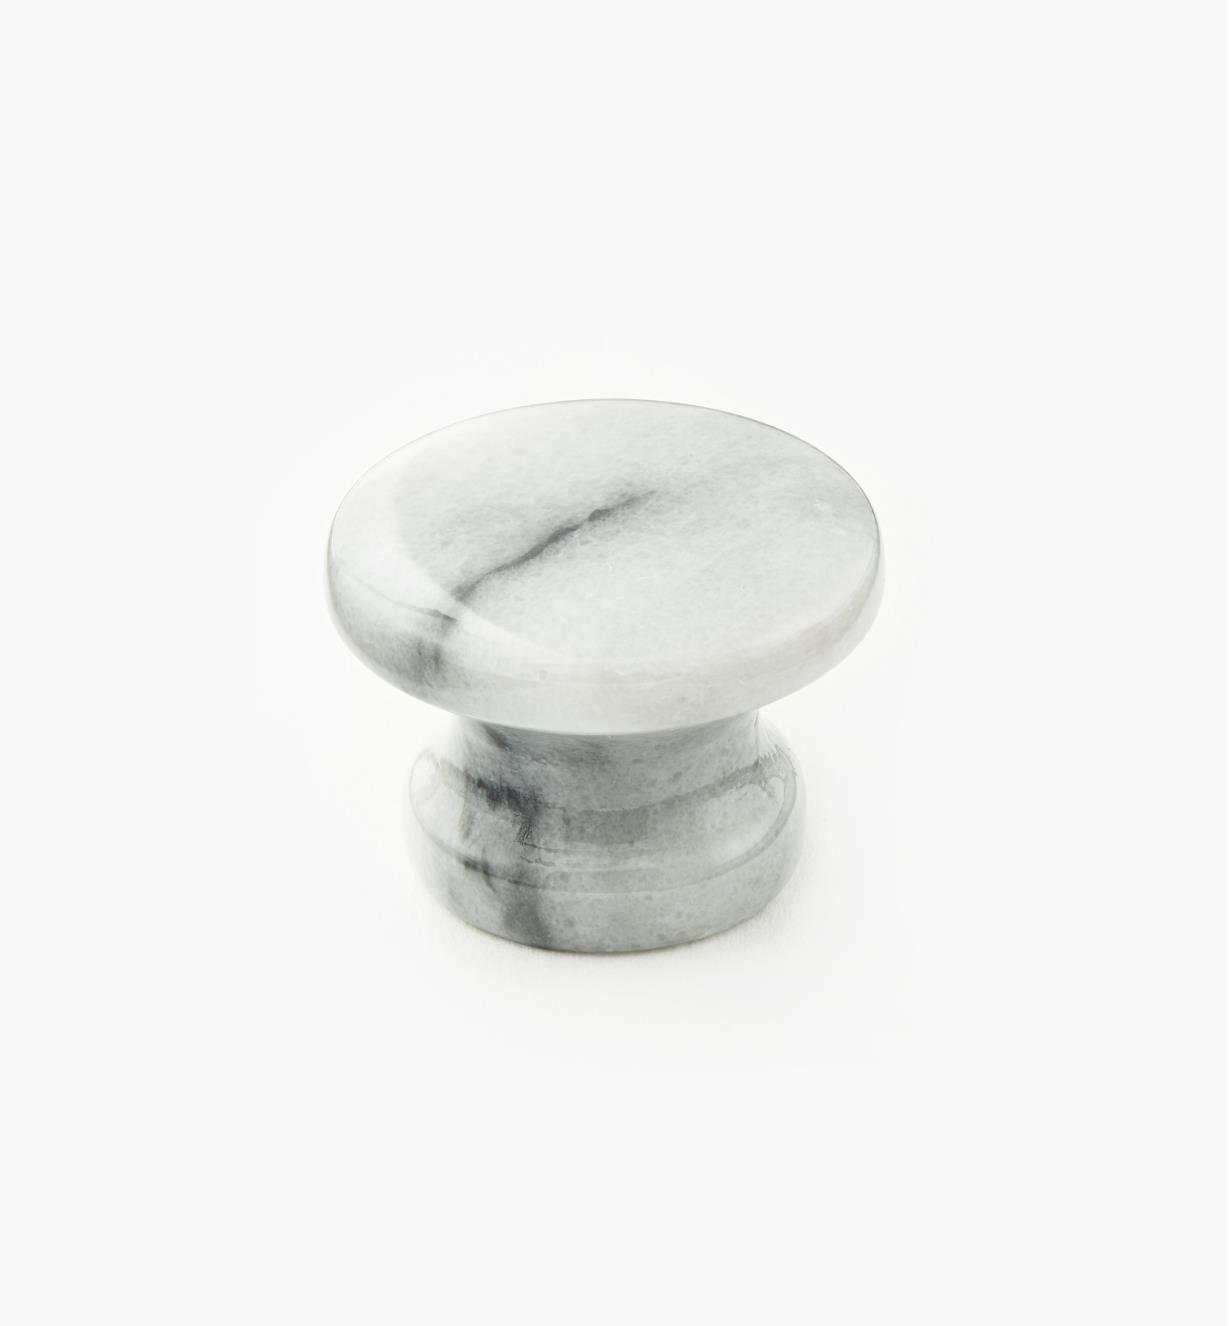 00W4024 - White Marble Knob, 34mm x 25mm